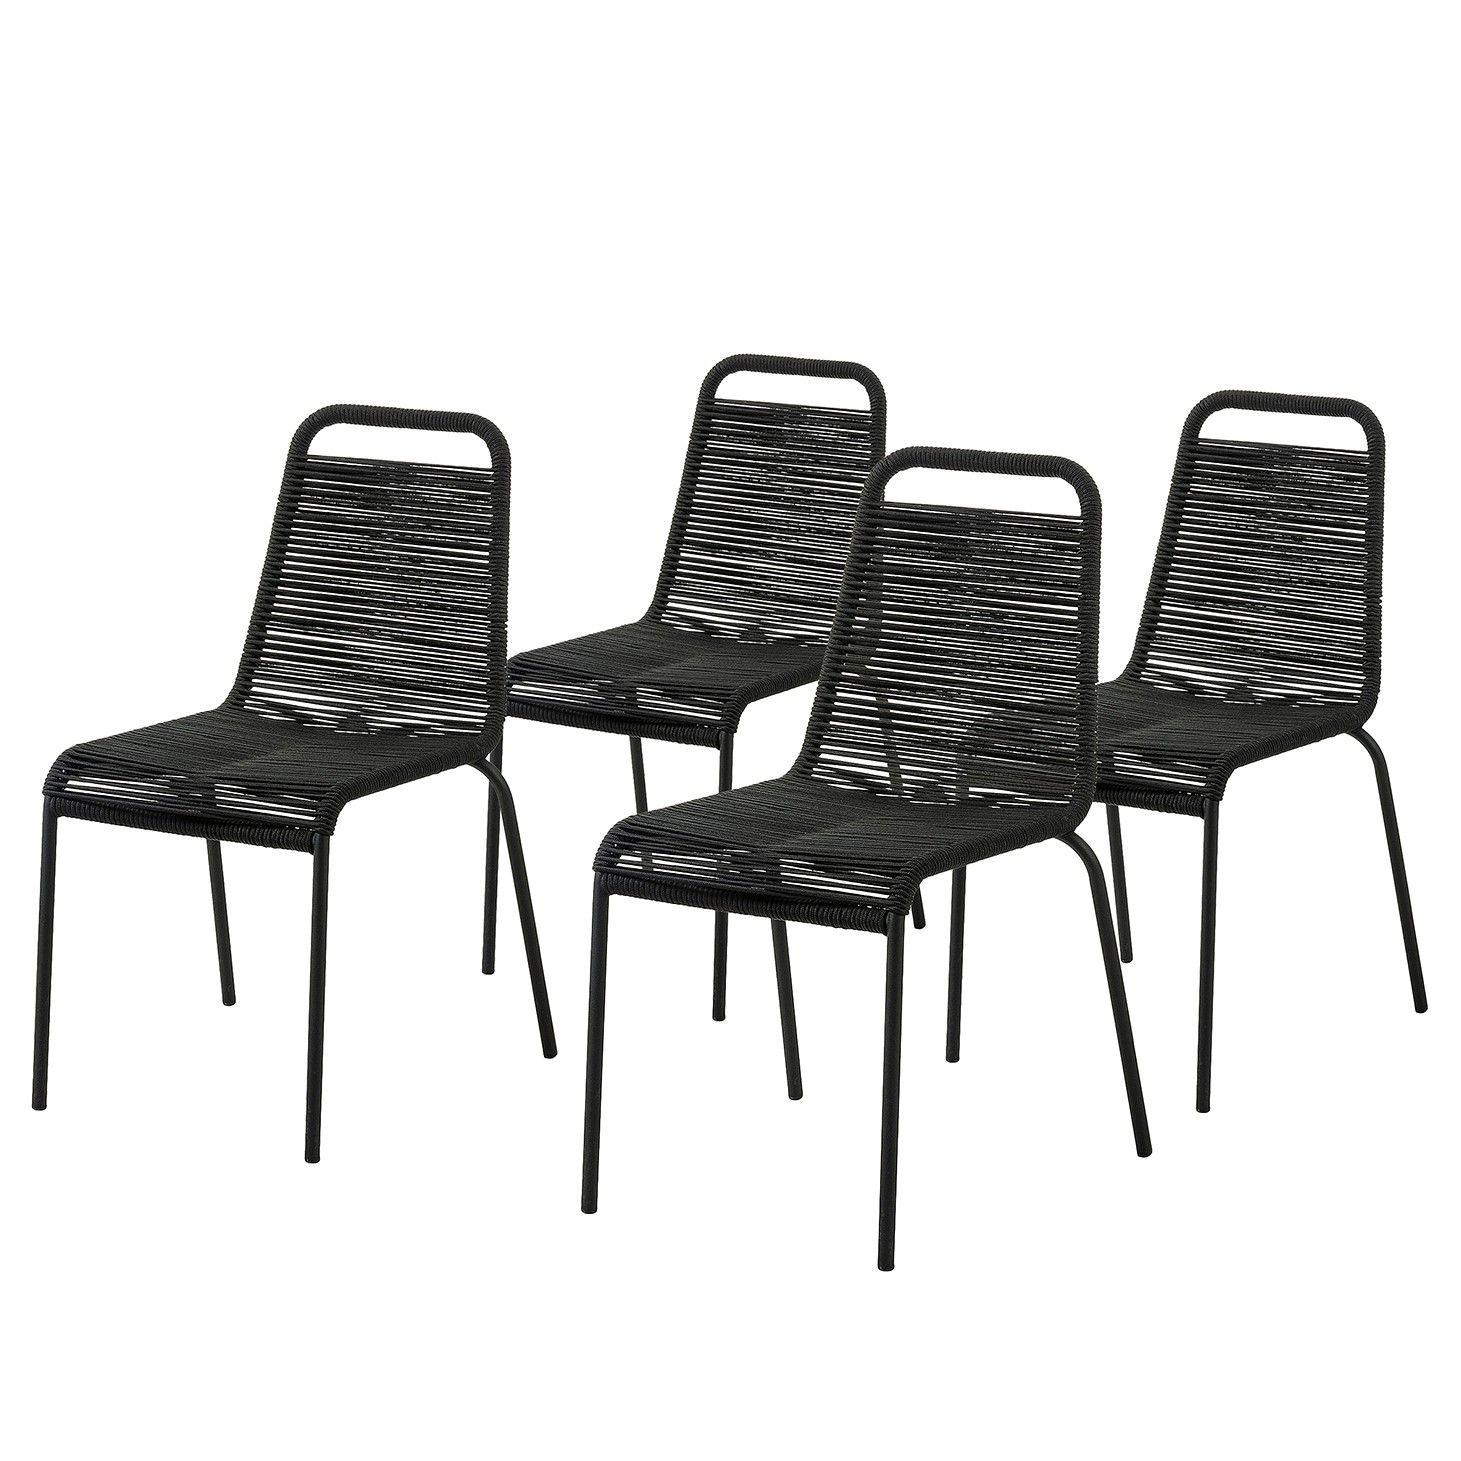 Stuhl Magra I 4er Set Kaufen Home24 In 2021 Stuhle Kaufen Stuhle Gartensessel